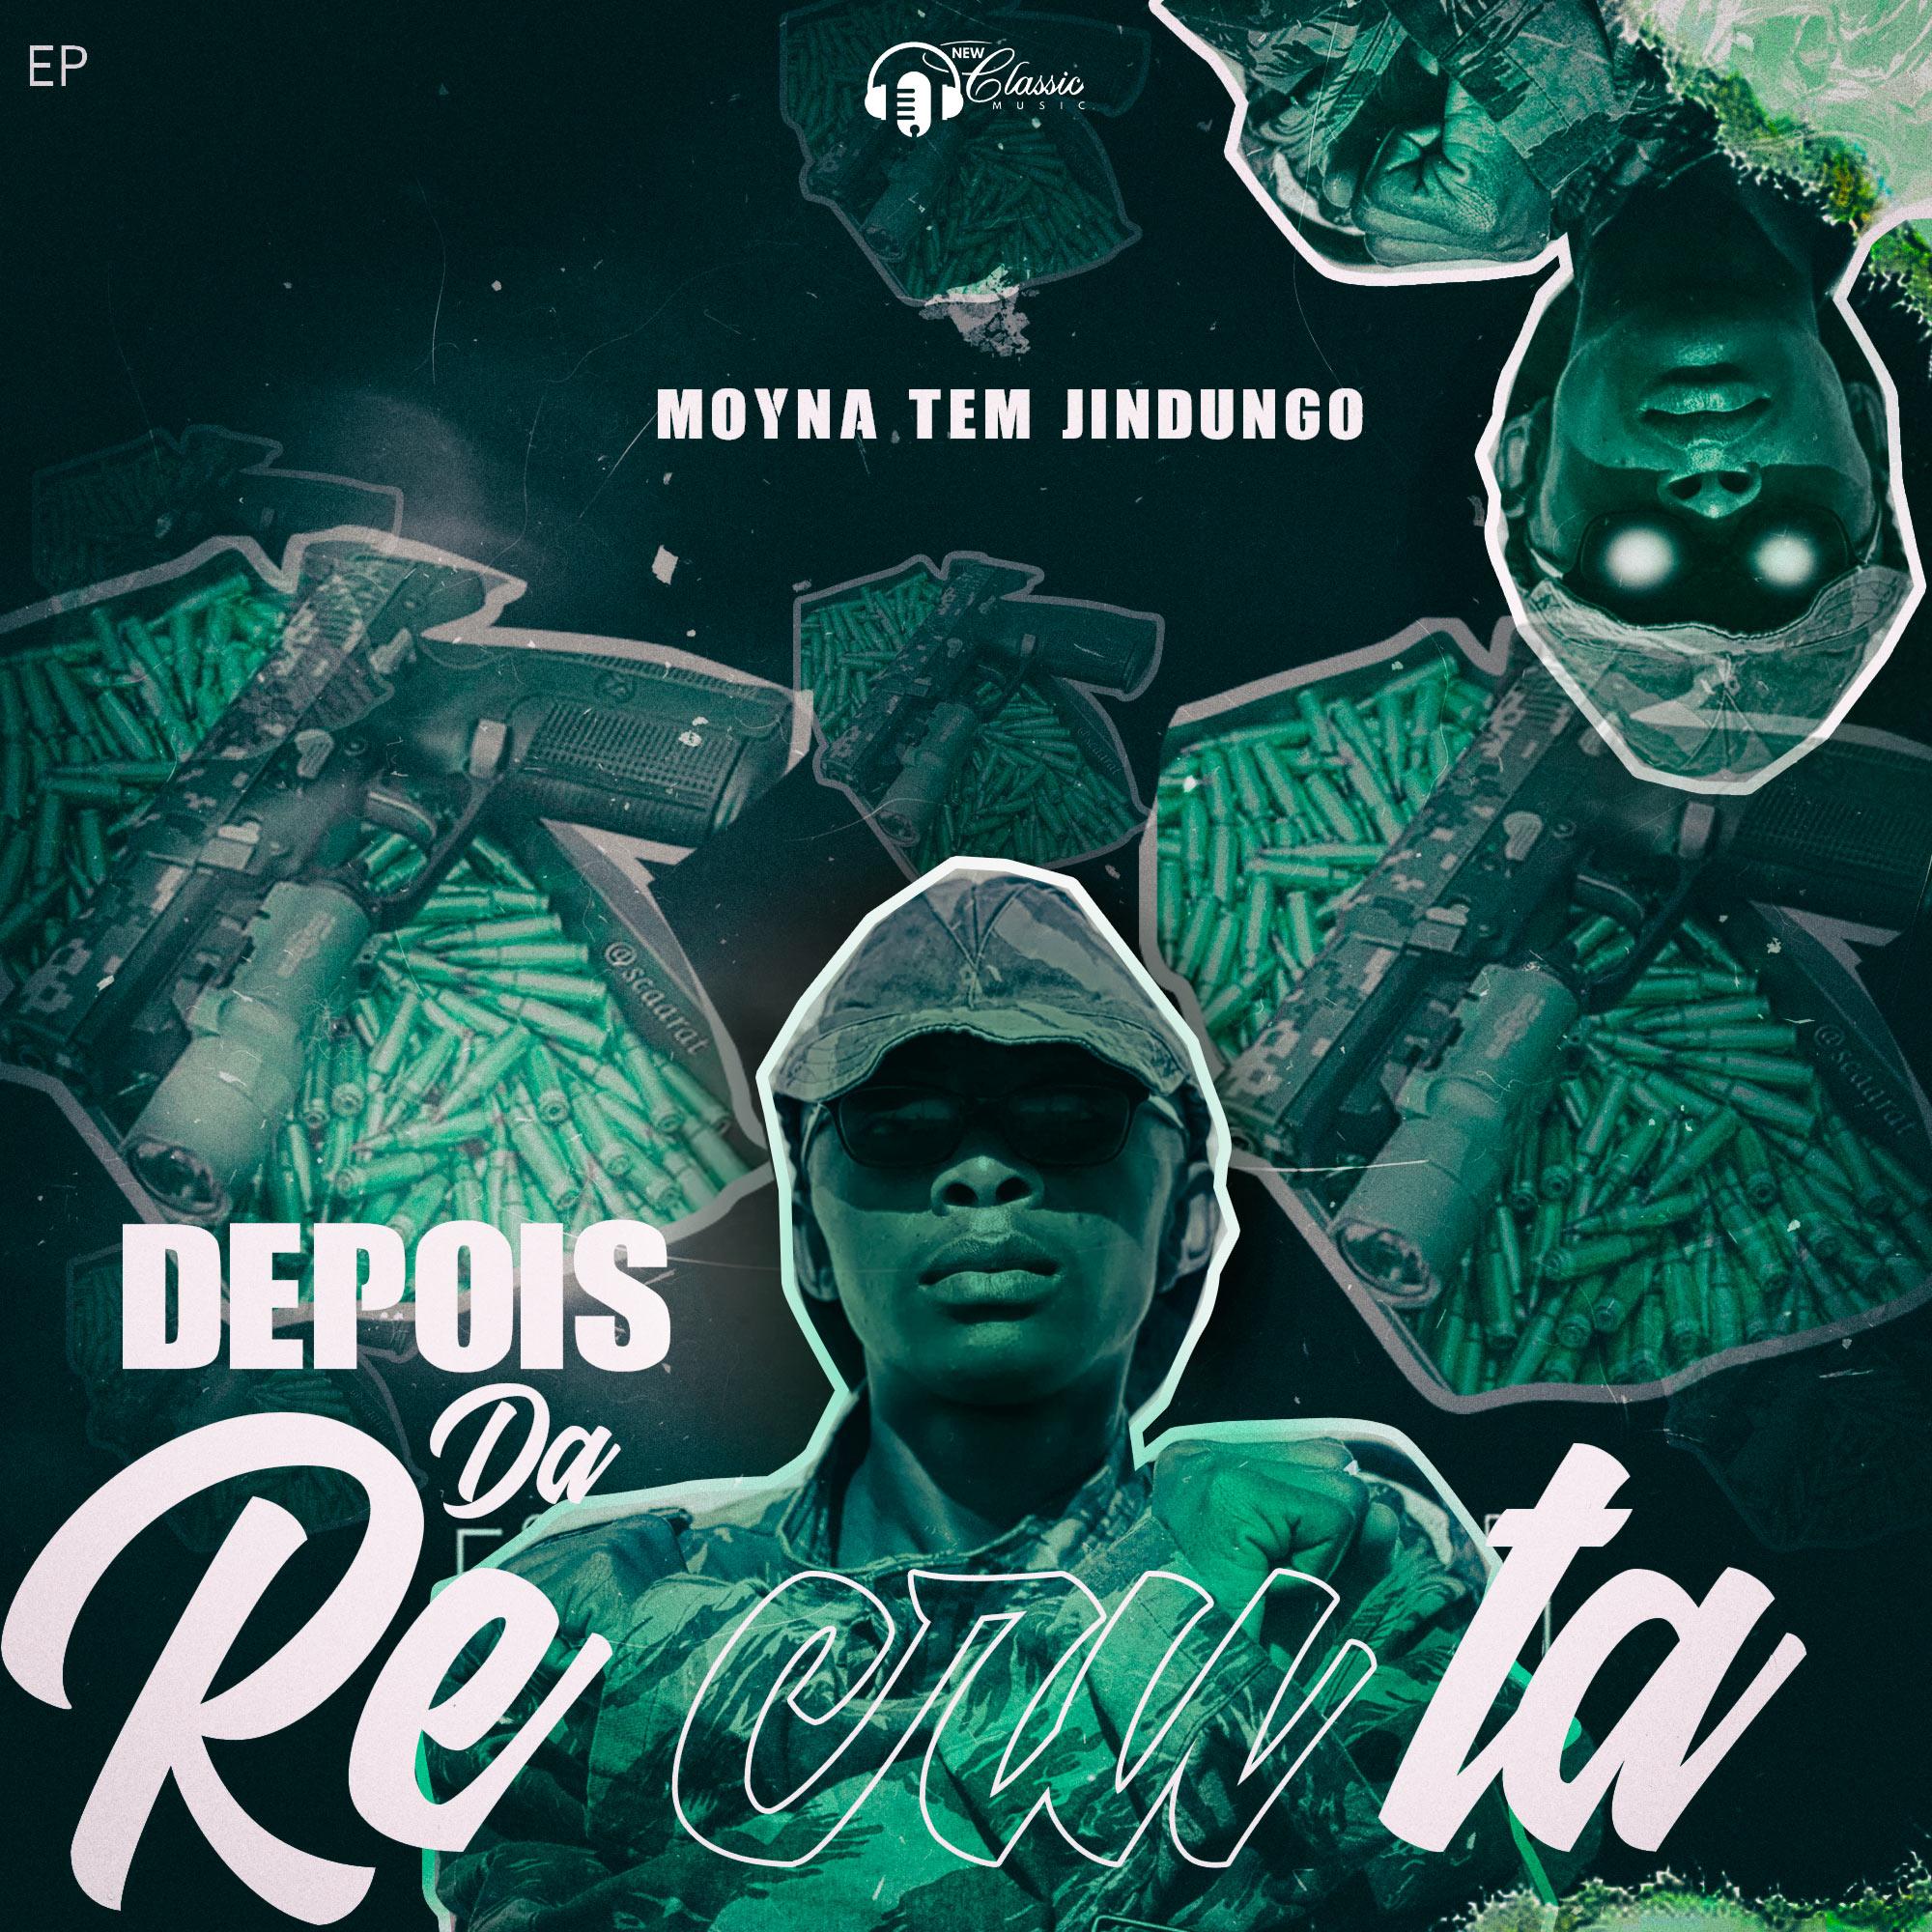 Moyna Tem Jindungo - Depois Da Recruta (EP)